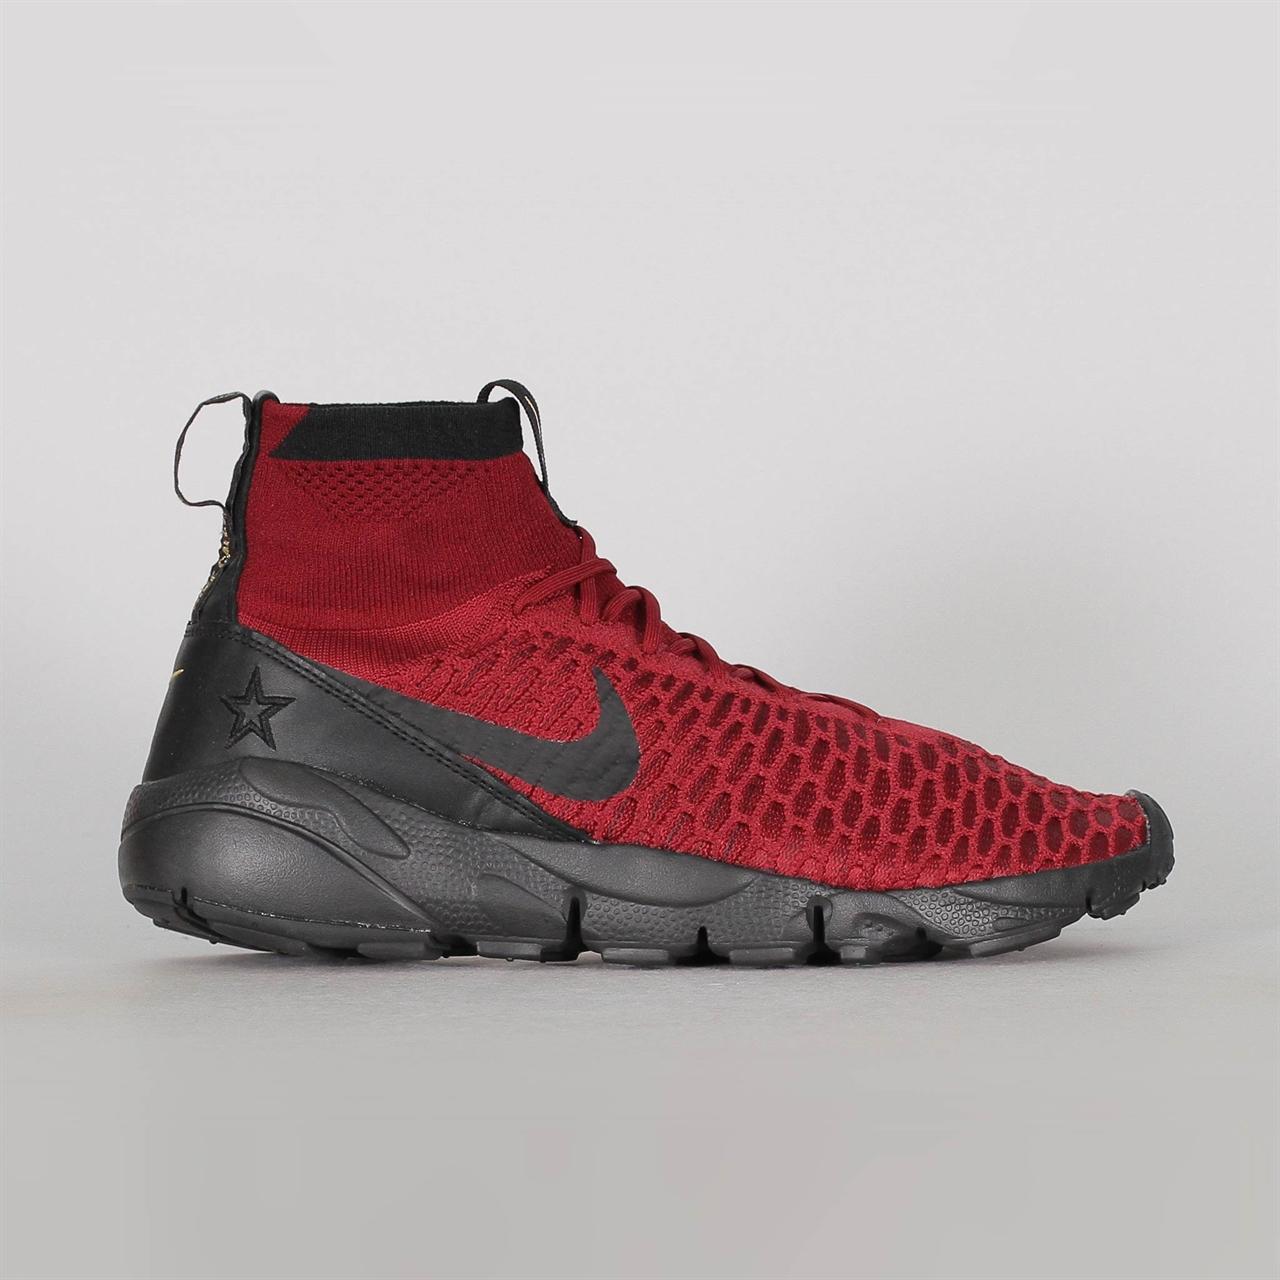 66c58eeb6b38 Nike Sportswear Air Footscape Magista Flyknit FC (830600-600) - Shelta